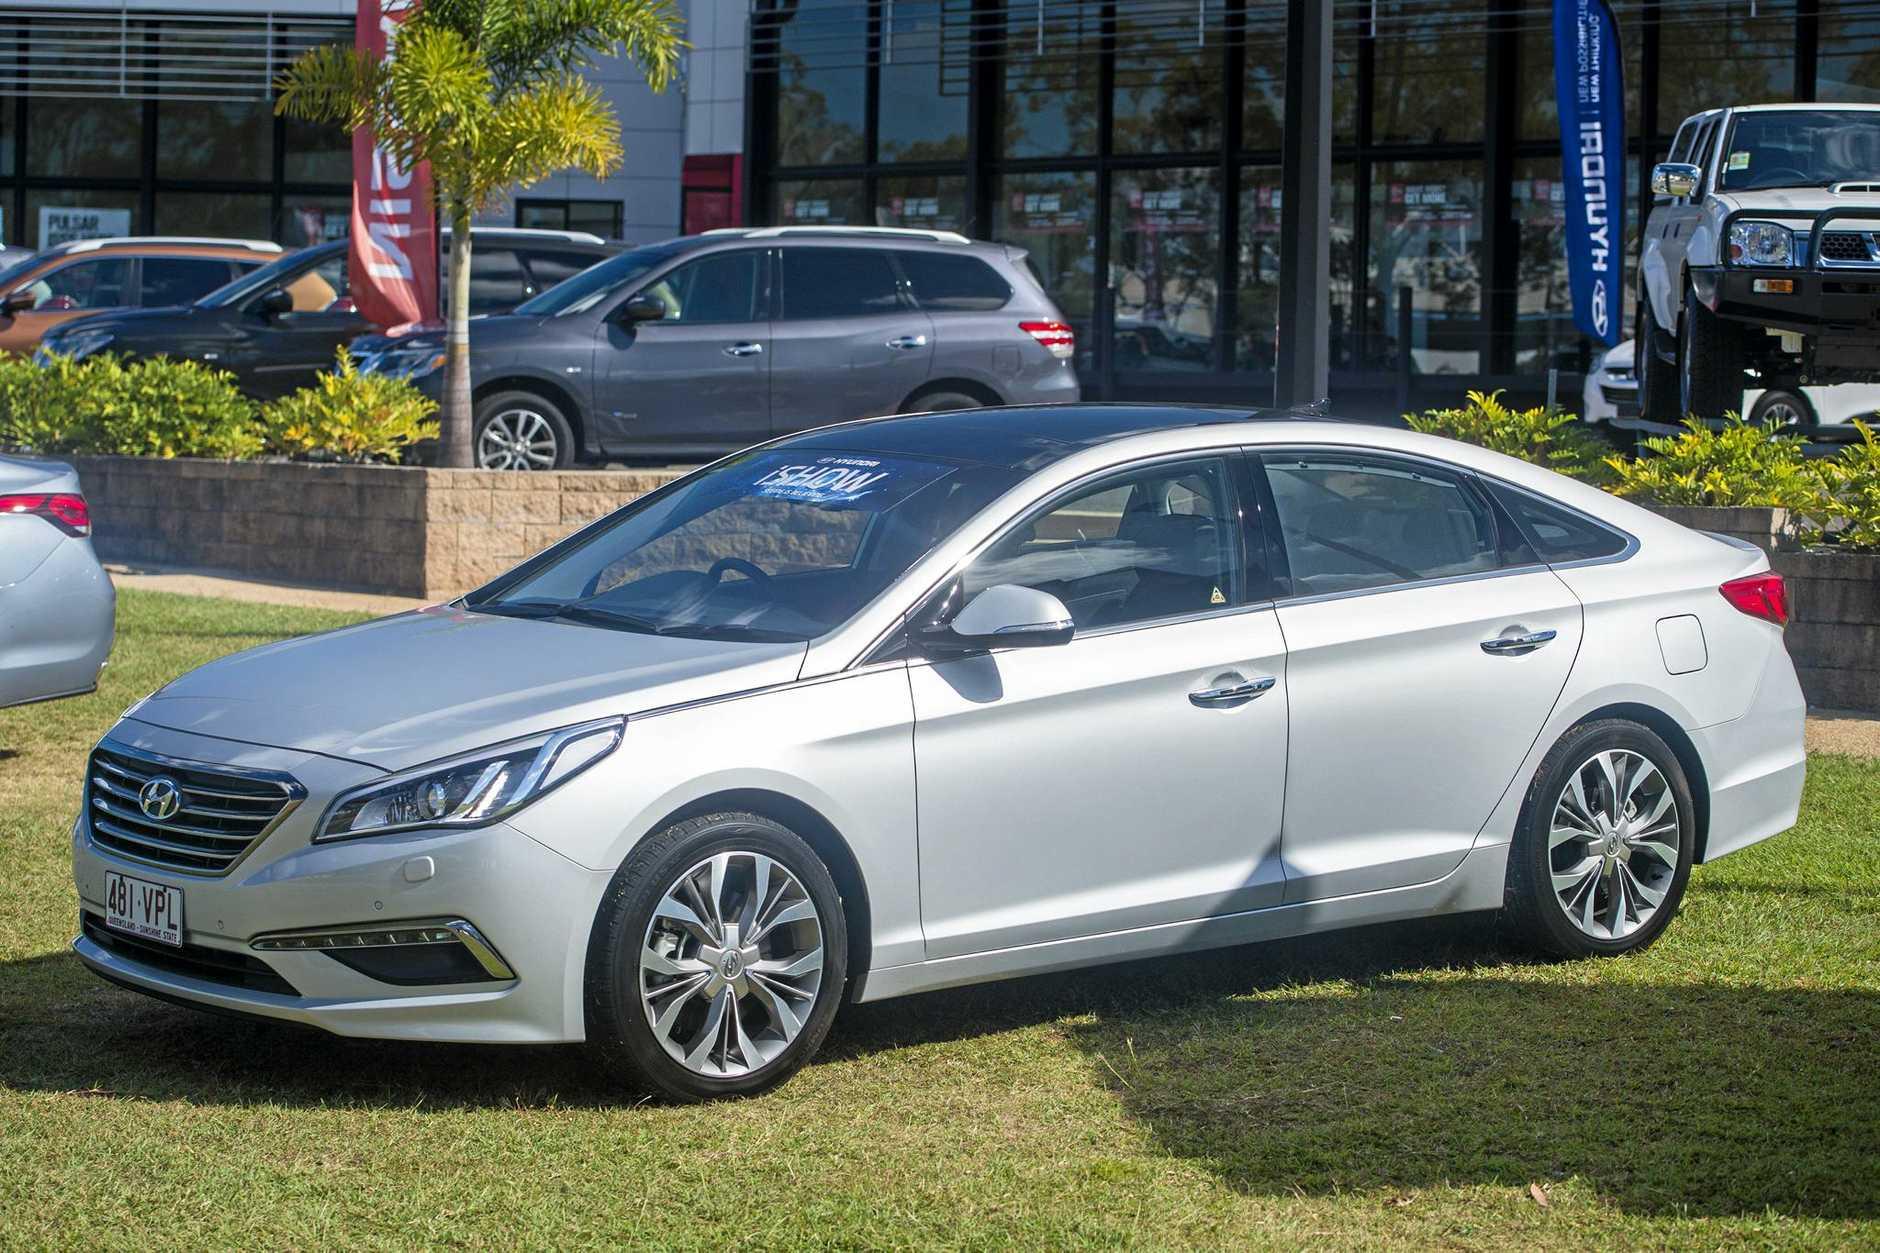 Hyundai Sonata. - Gladstone Hyundai's top range cars on show.  Photo: Paul Braven / The Observer